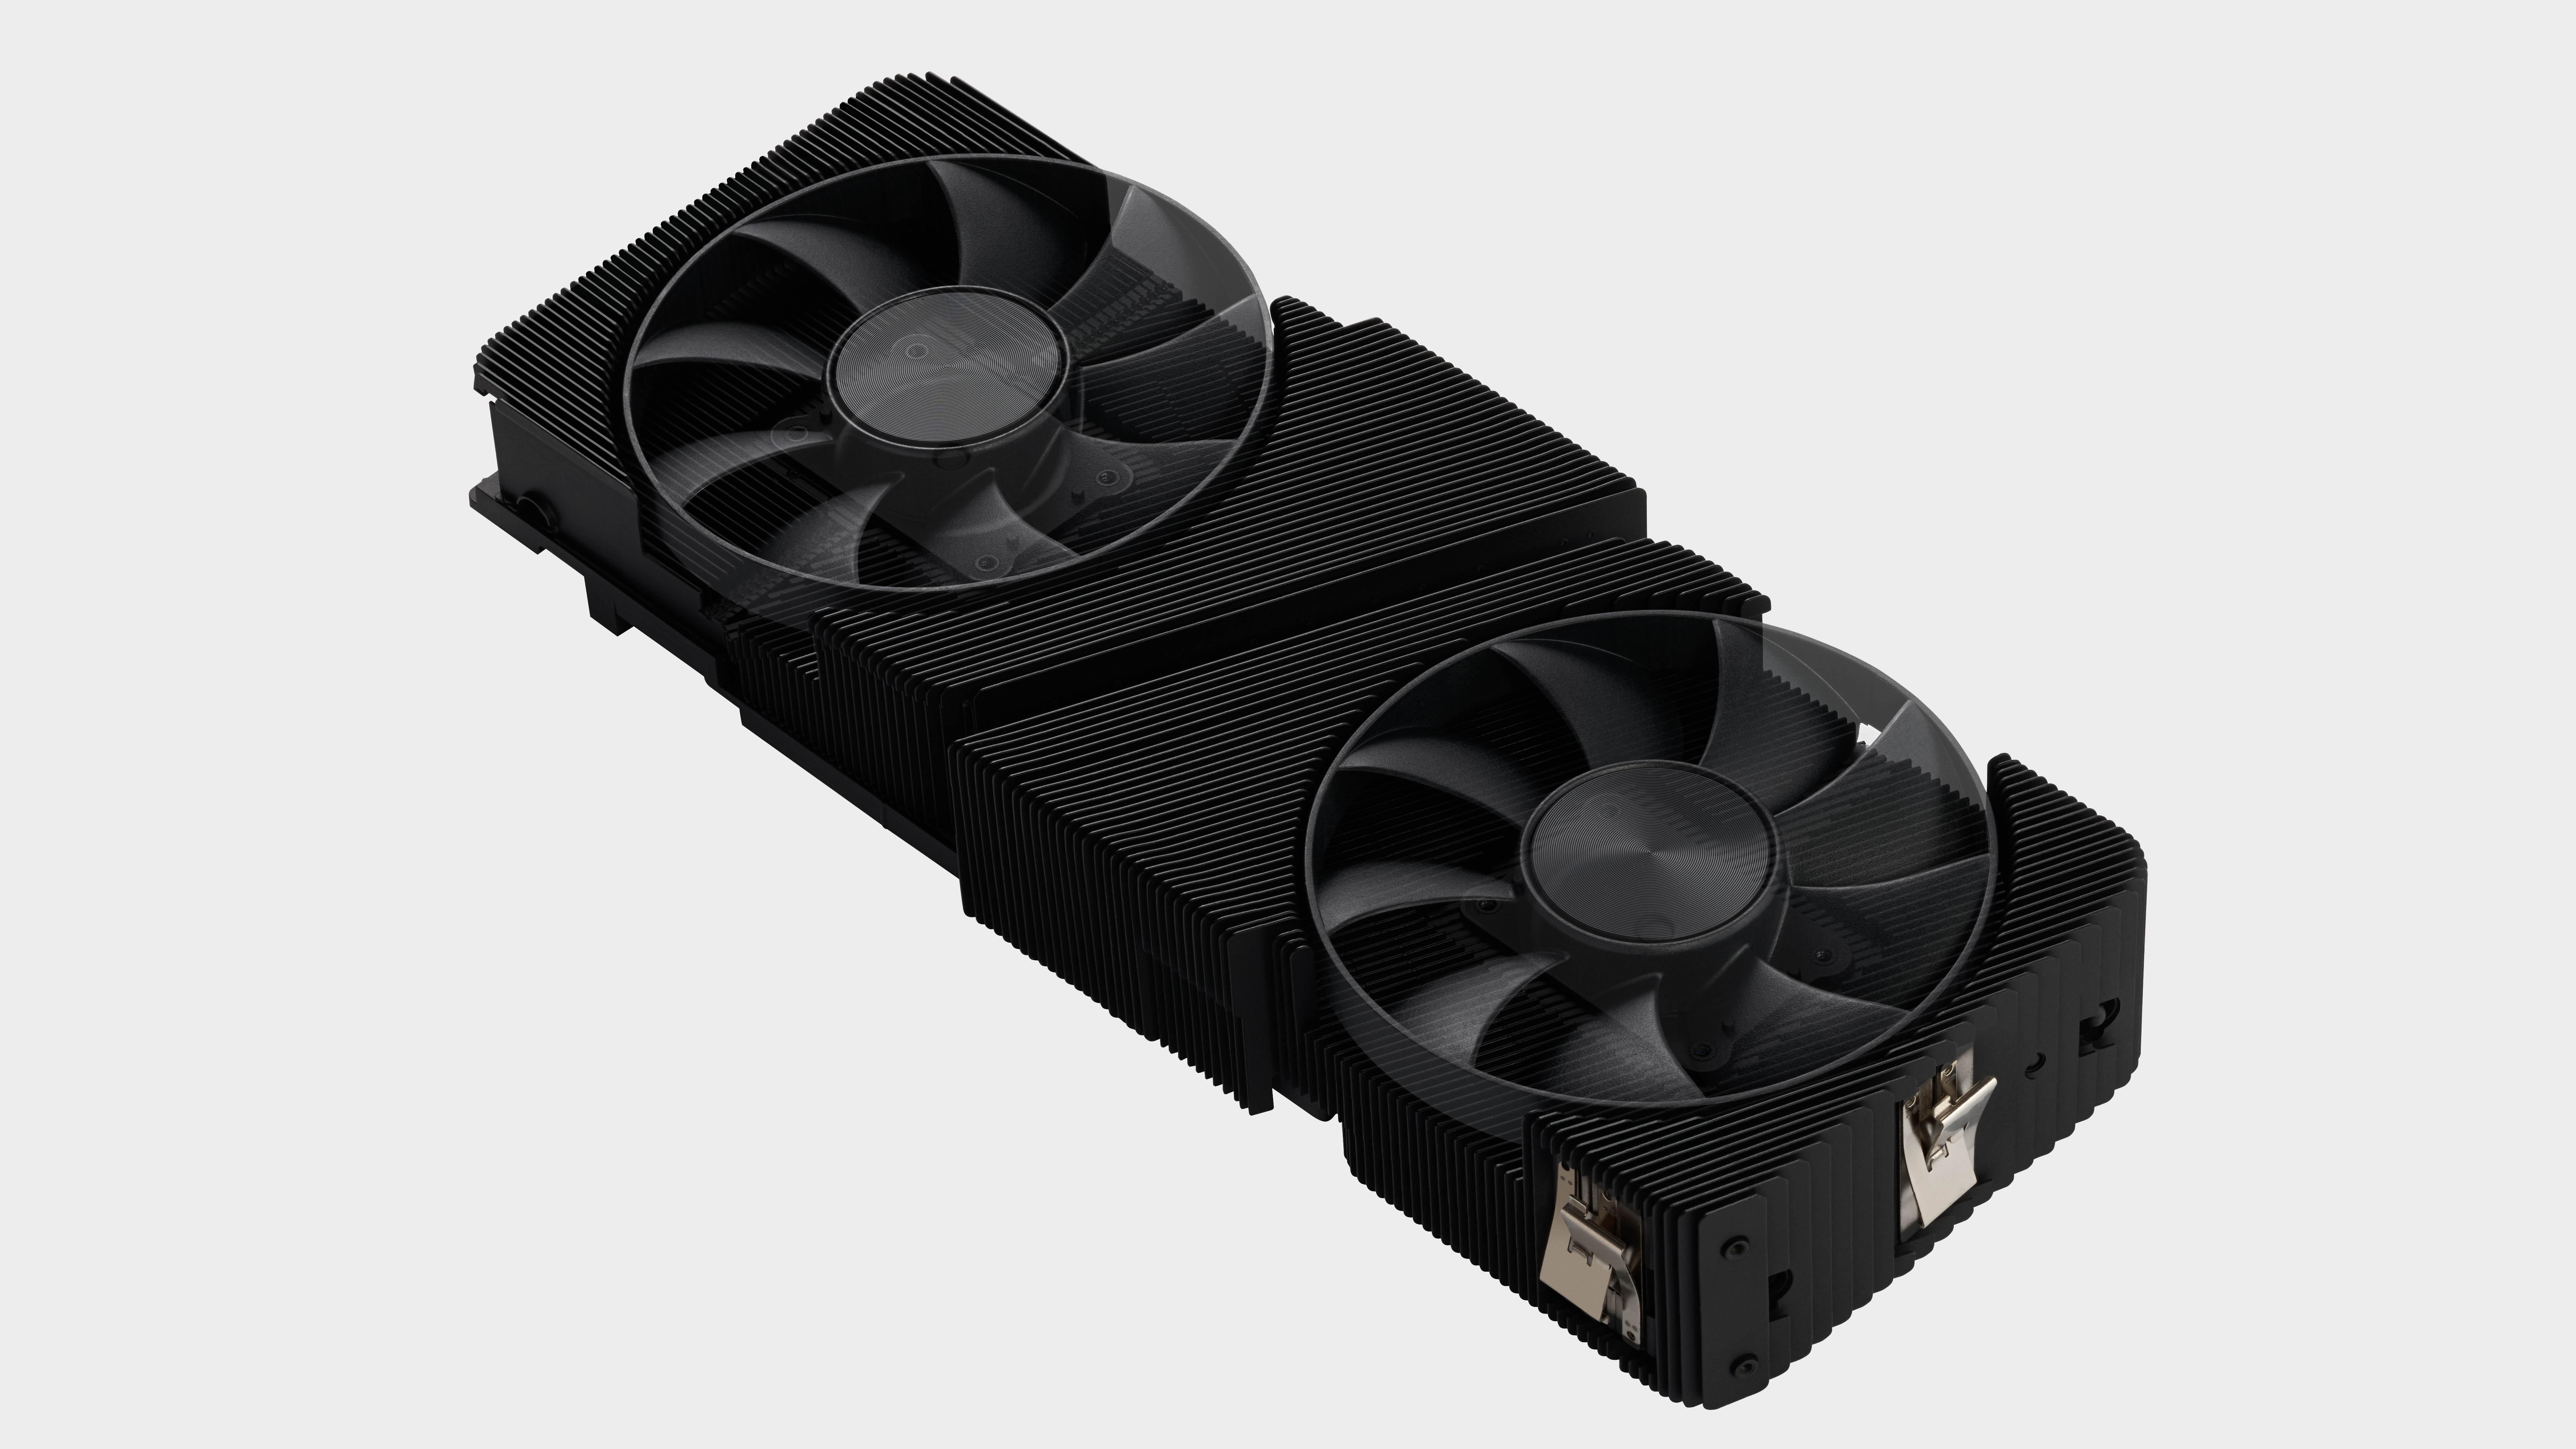 Nvidia RTX 3060 Ti cooler without shroud